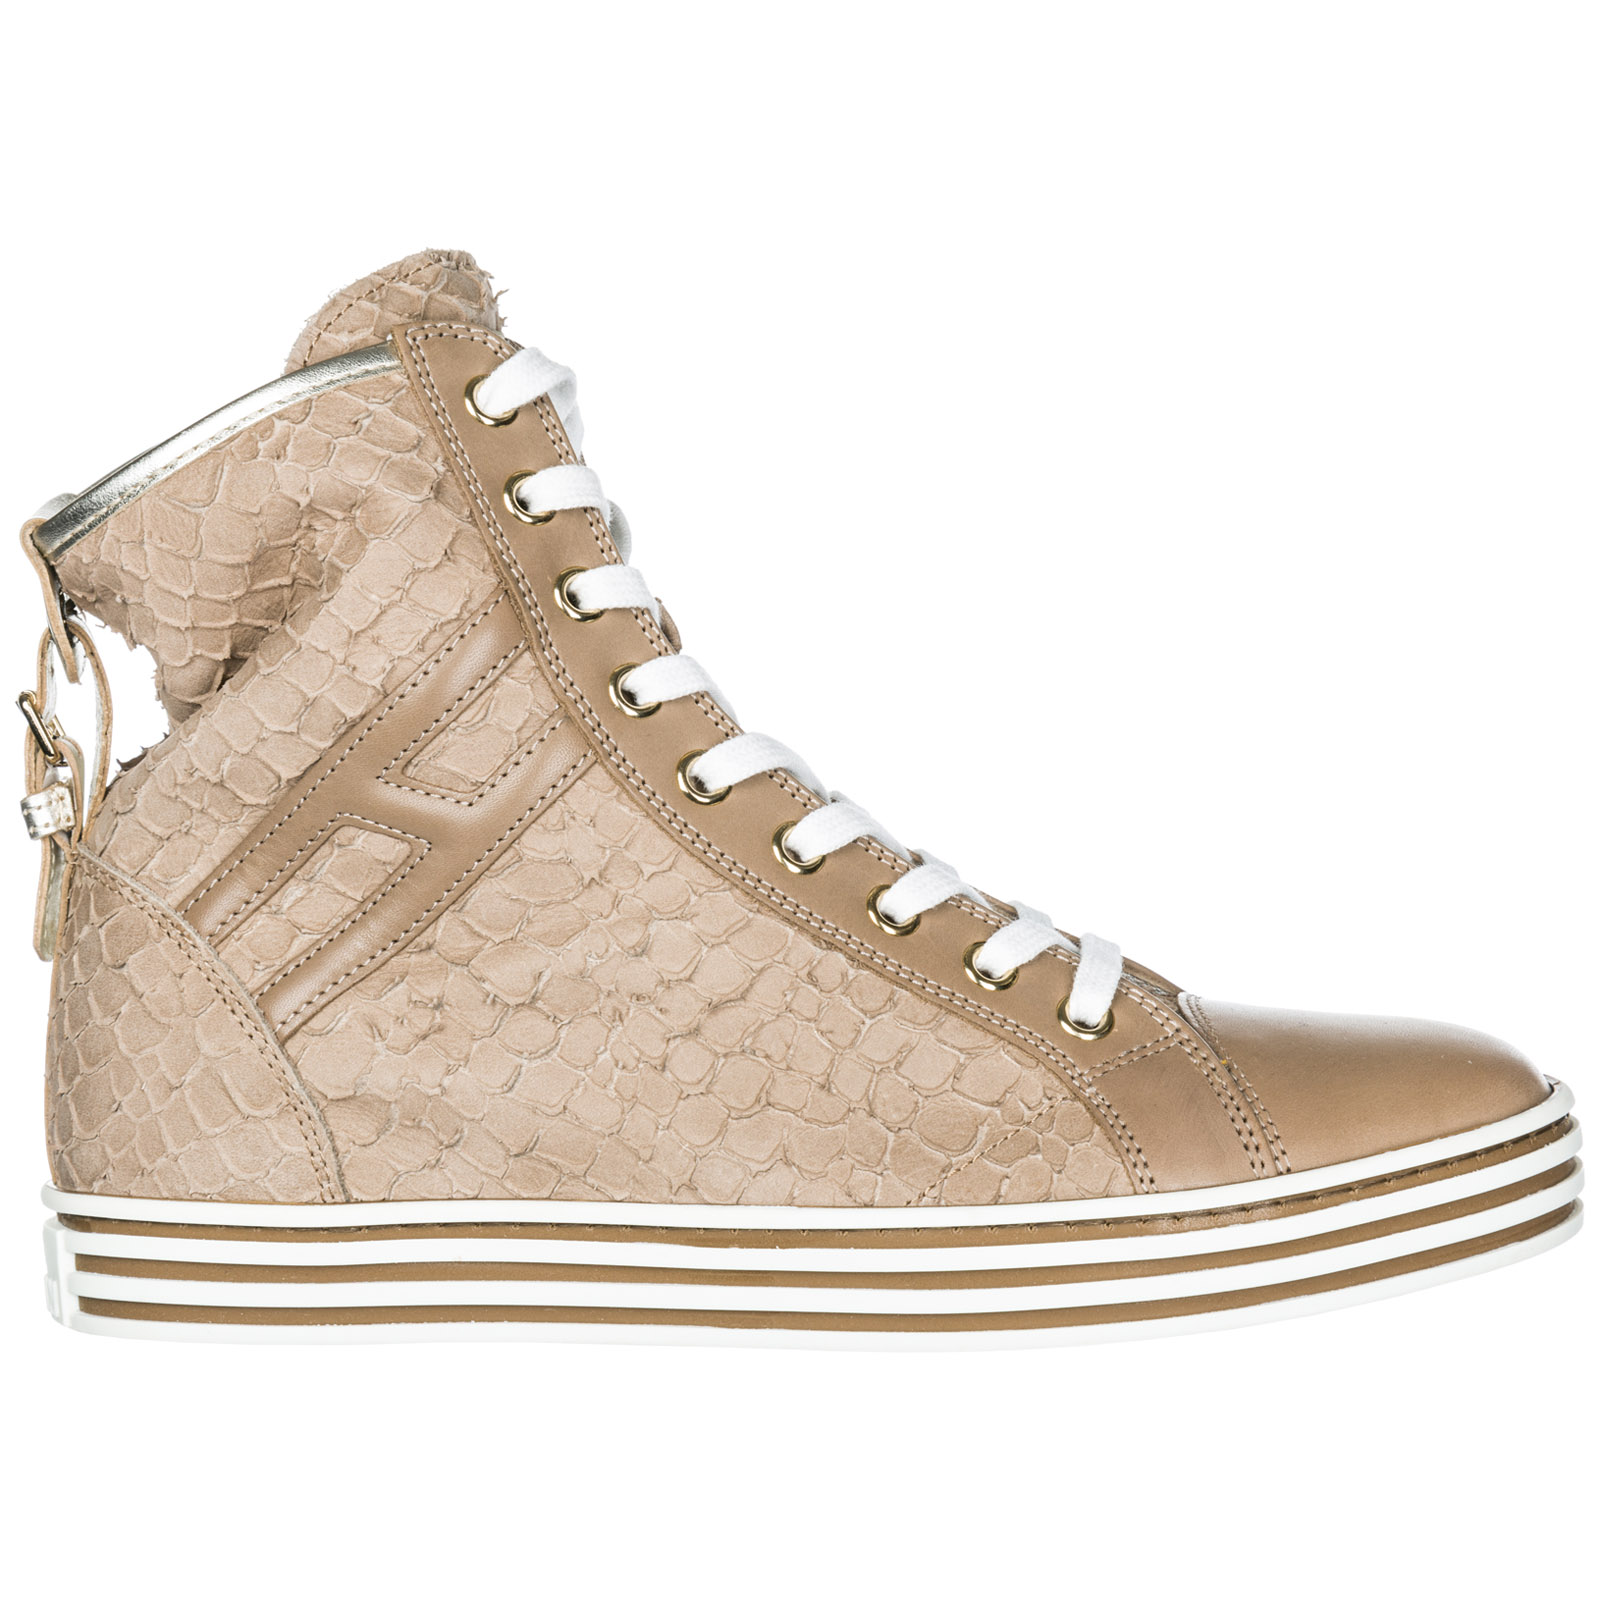 Sneakers Hogan Rebel R182 HXW1820D6608CS191Y beige  fdbfa1793f7